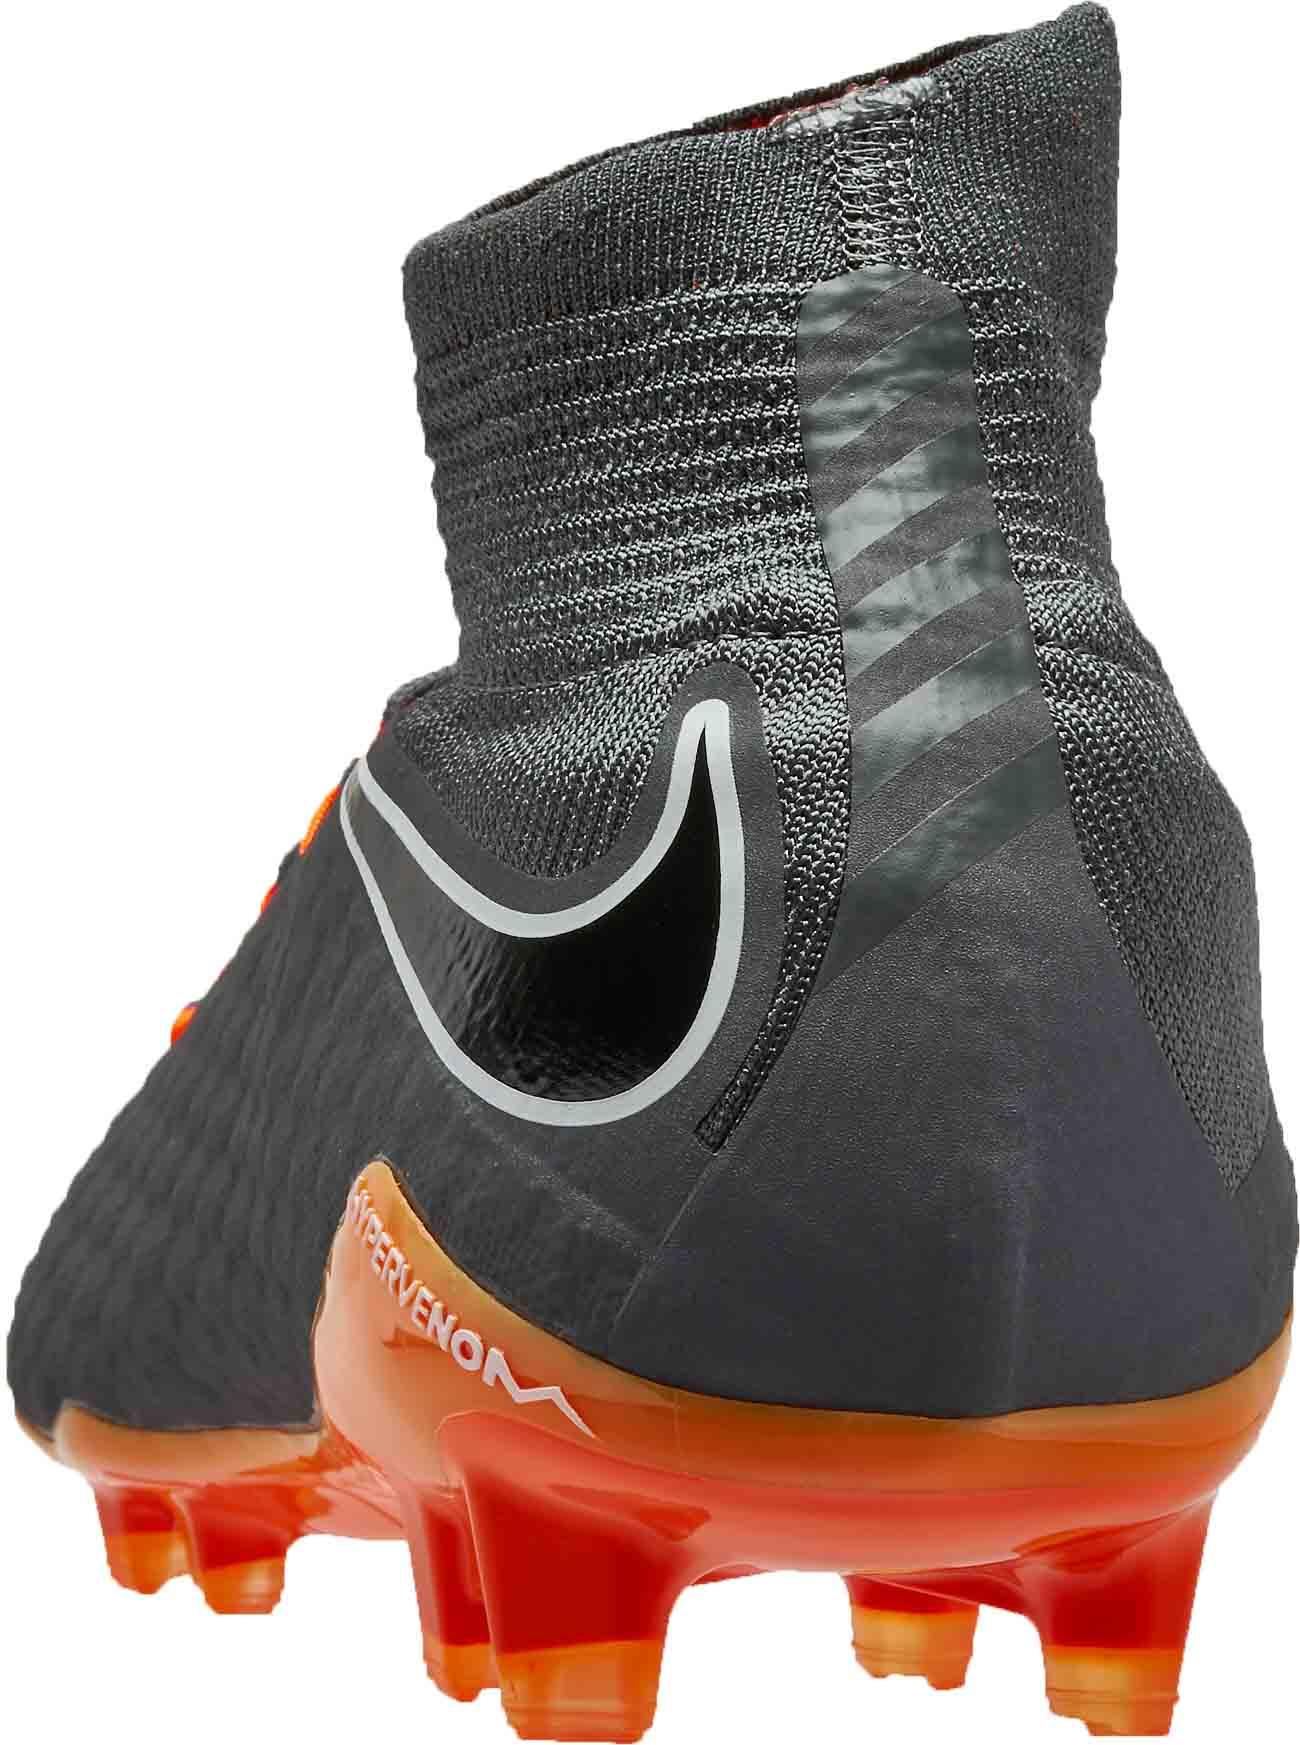 dc275aa5b Nike Hypervenom Phantom 3 Pro DF FG - Dark Grey Total Orange - SoccerPro